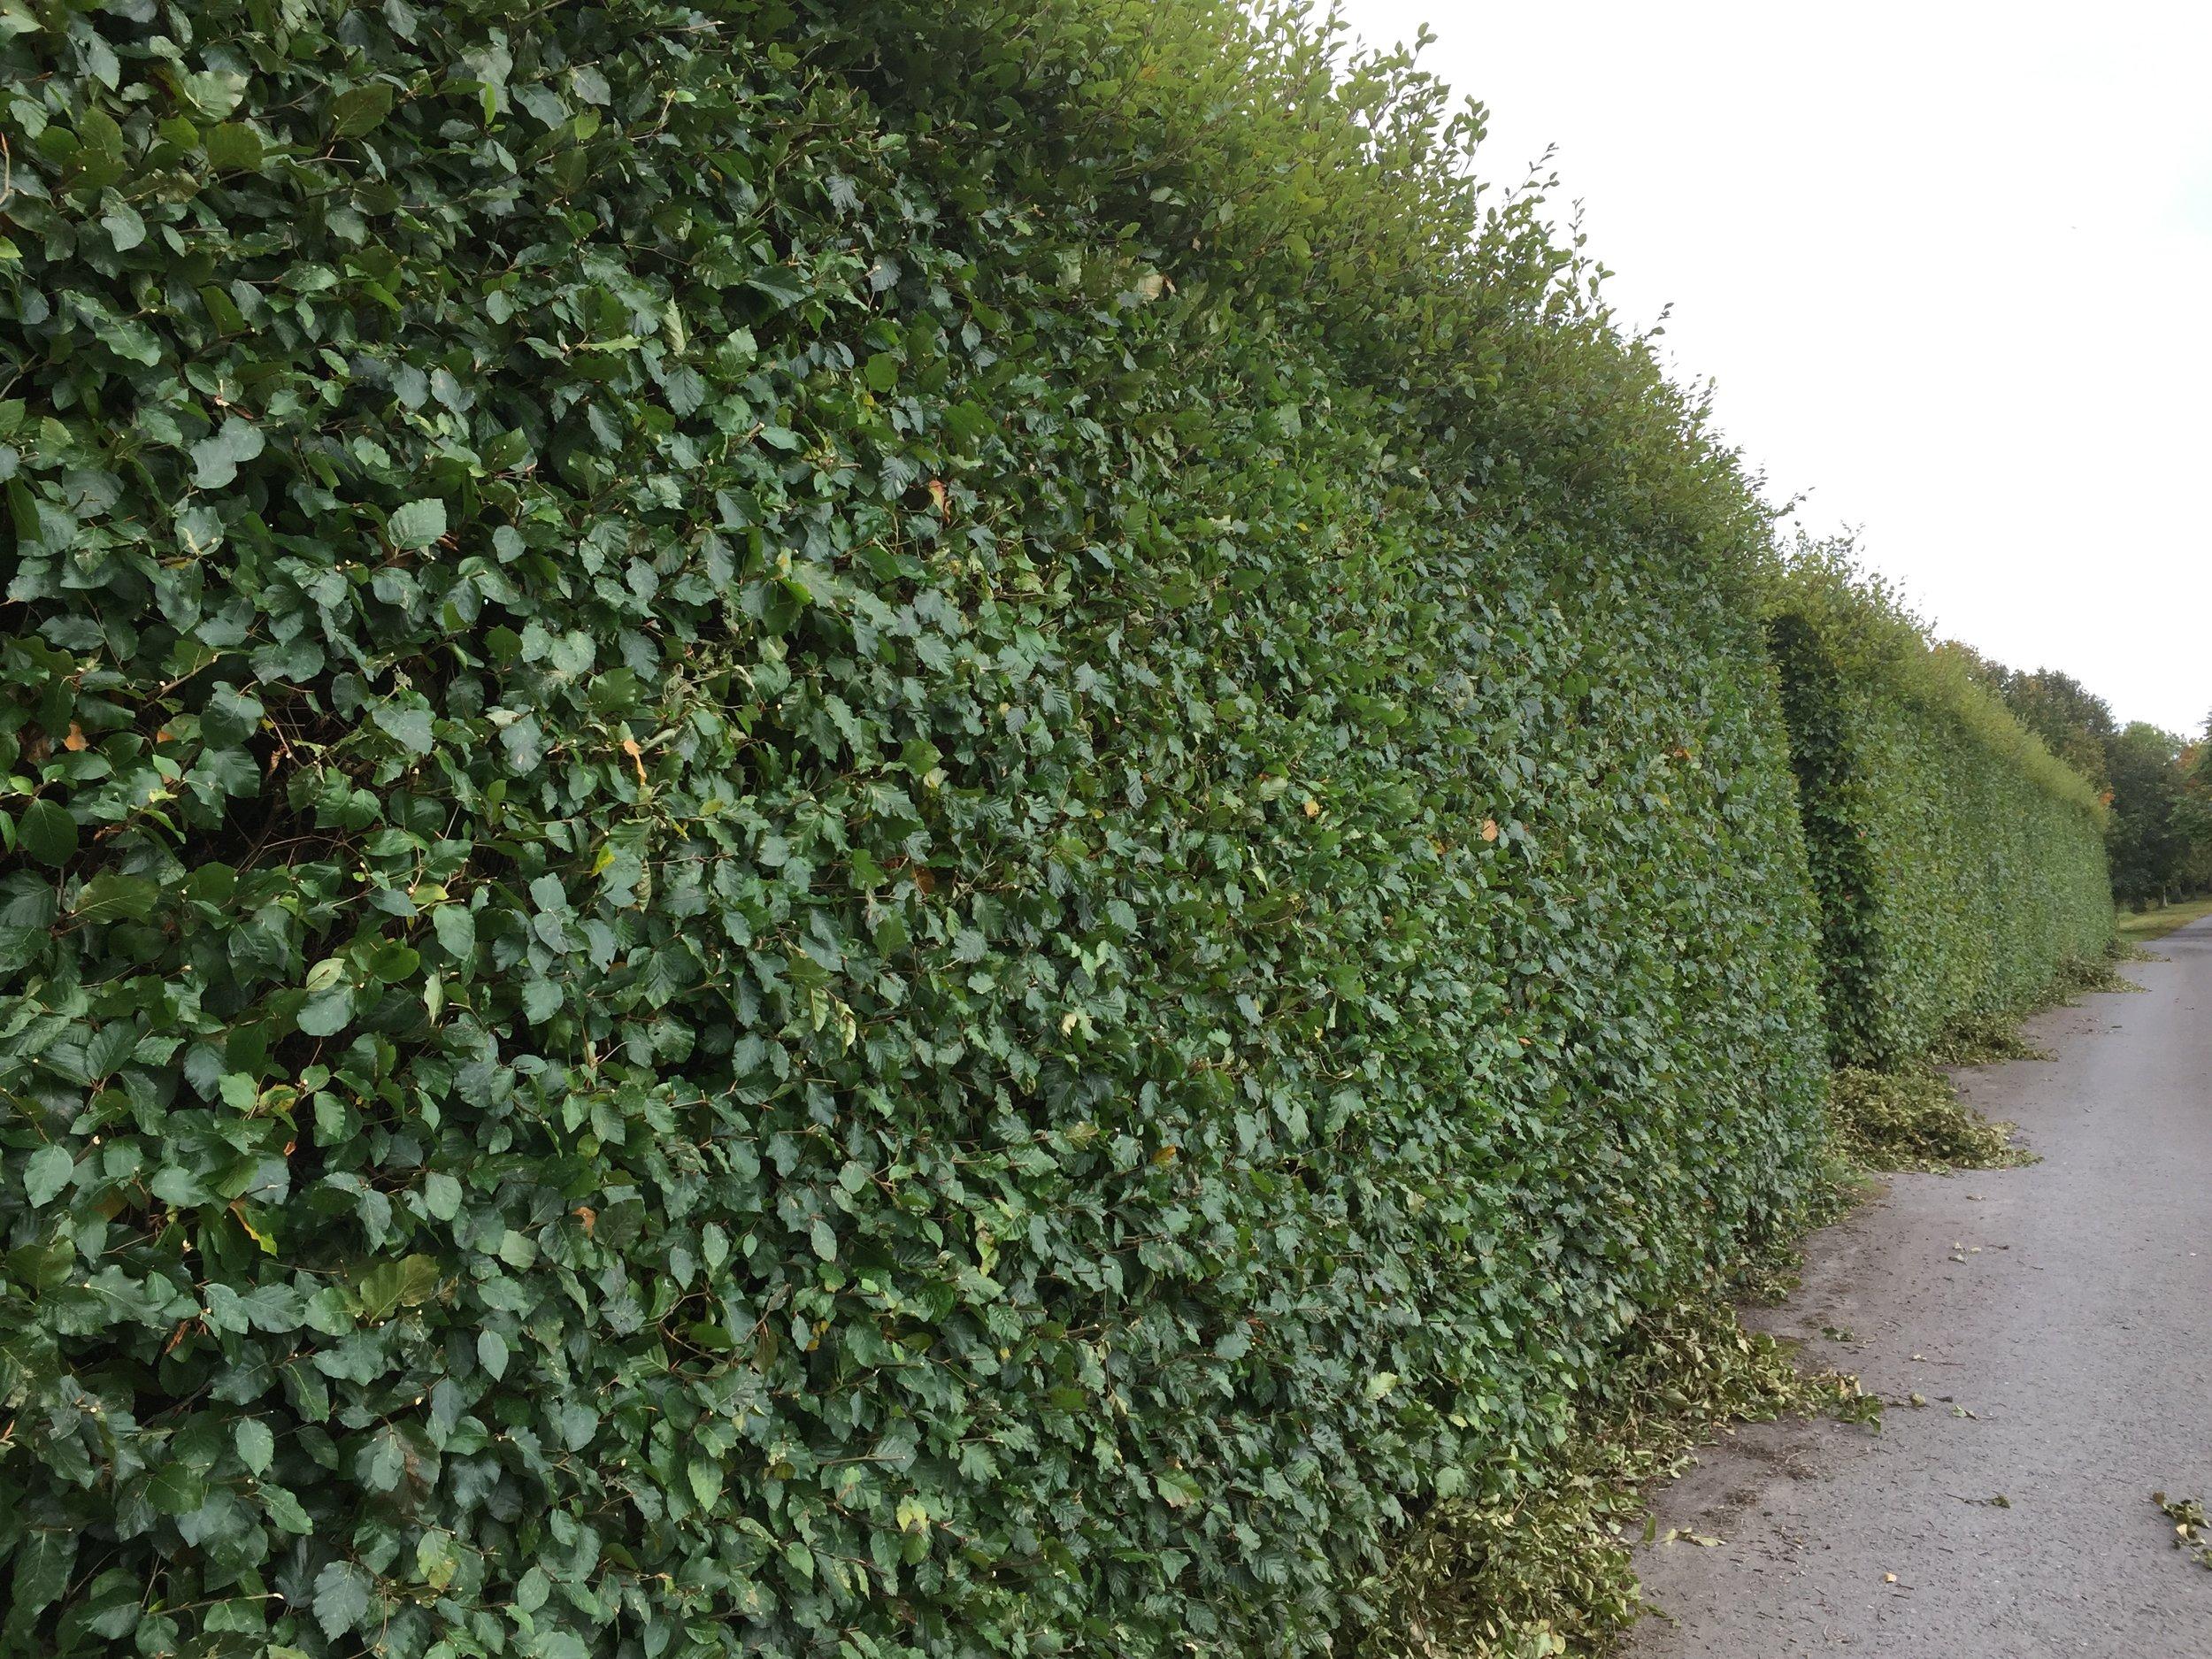 A beech hedge (Fagus sylvatica) is being trimmed but is still green.